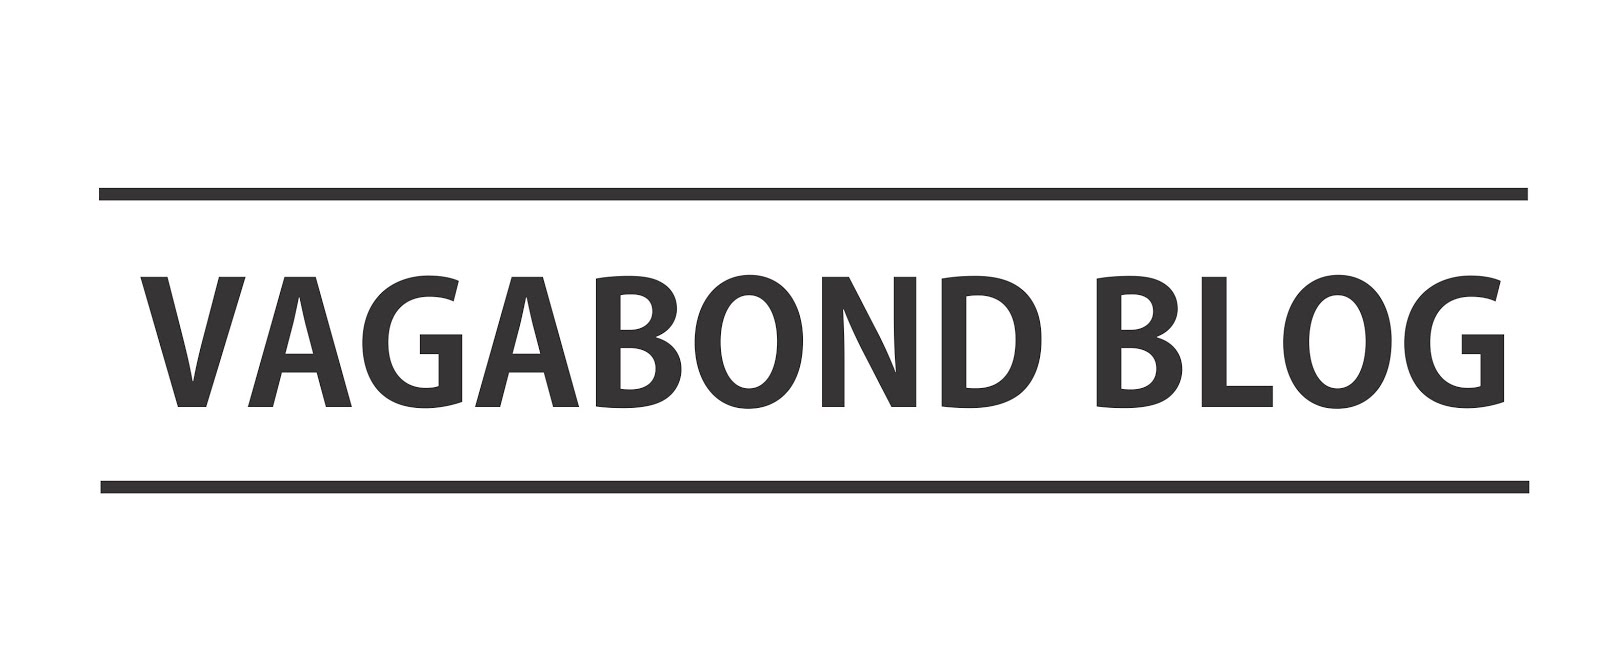 vagabond's blog